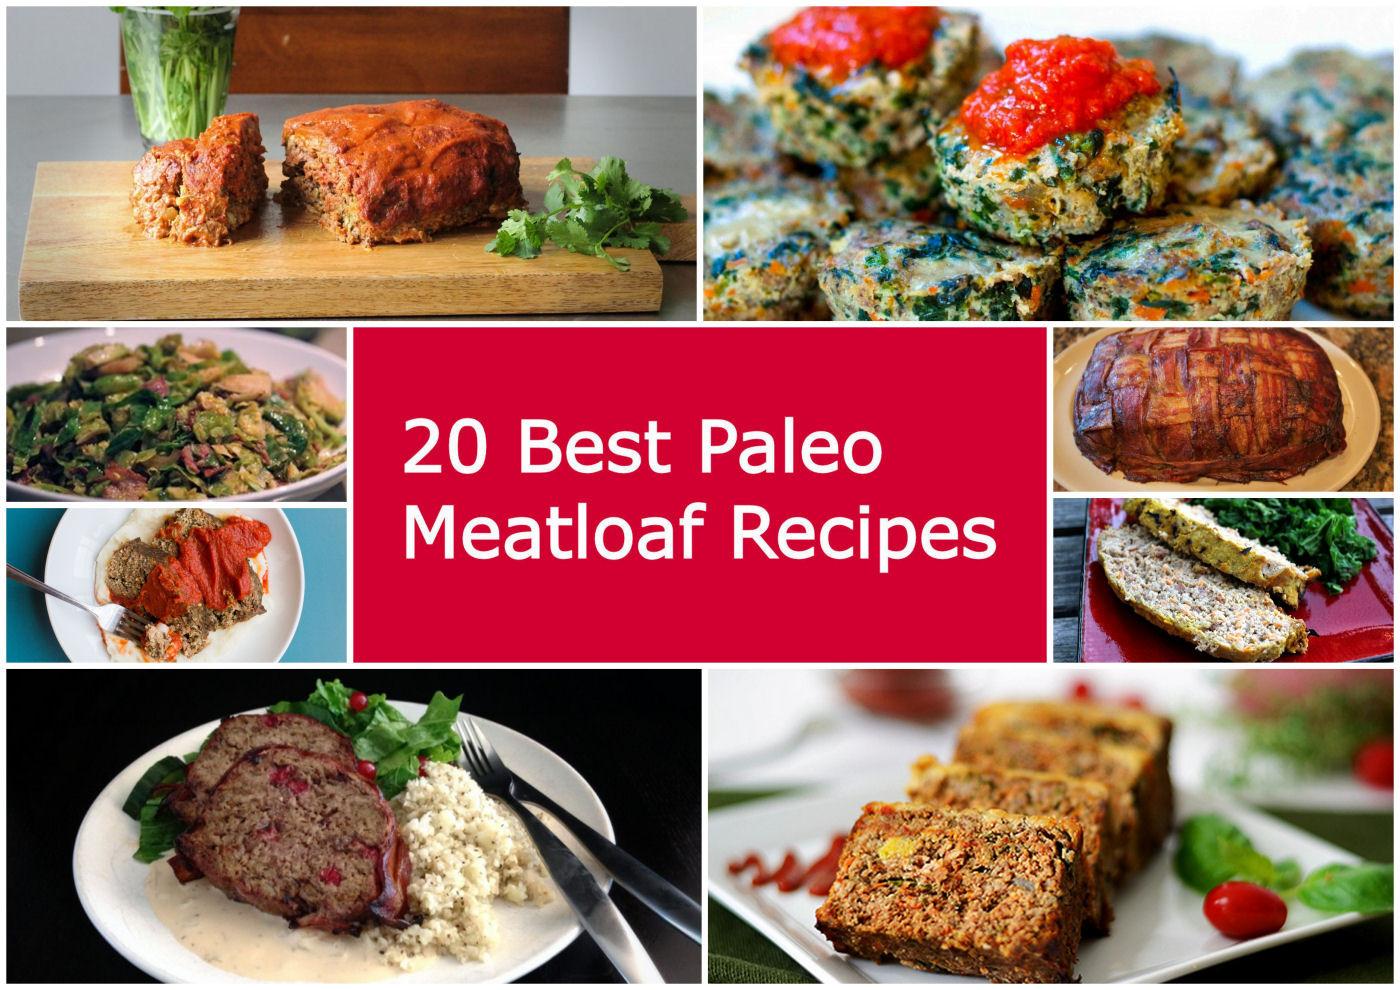 Best Paleo Dinner Recipes  20 Best Paleo Meatloaf Recipes Paleo Zone Recipes